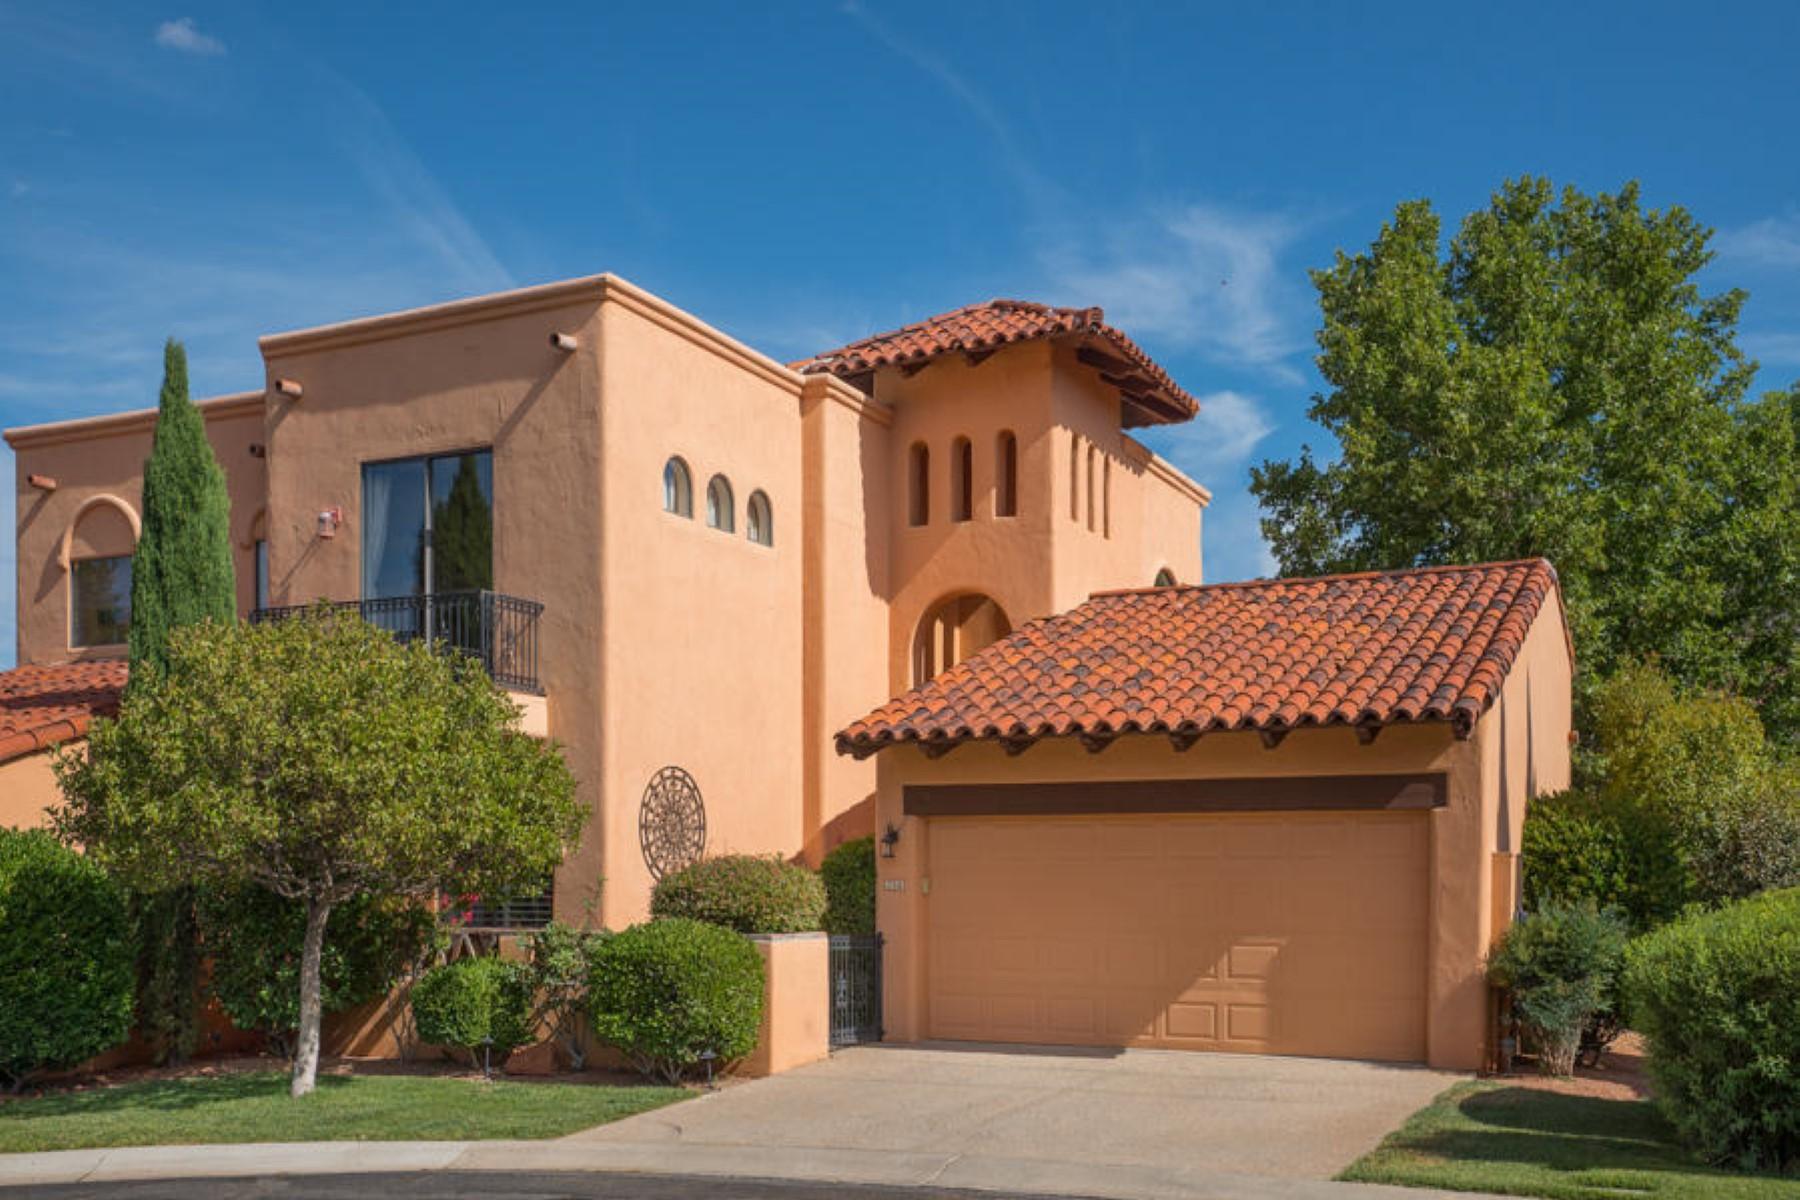 Tek Ailelik Ev için Satış at The Ridge at Sedona is a gorgeous gated community with resort amenities 26 Rim Trail Circle Sedona, Arizona 86351 Amerika Birleşik Devletleri